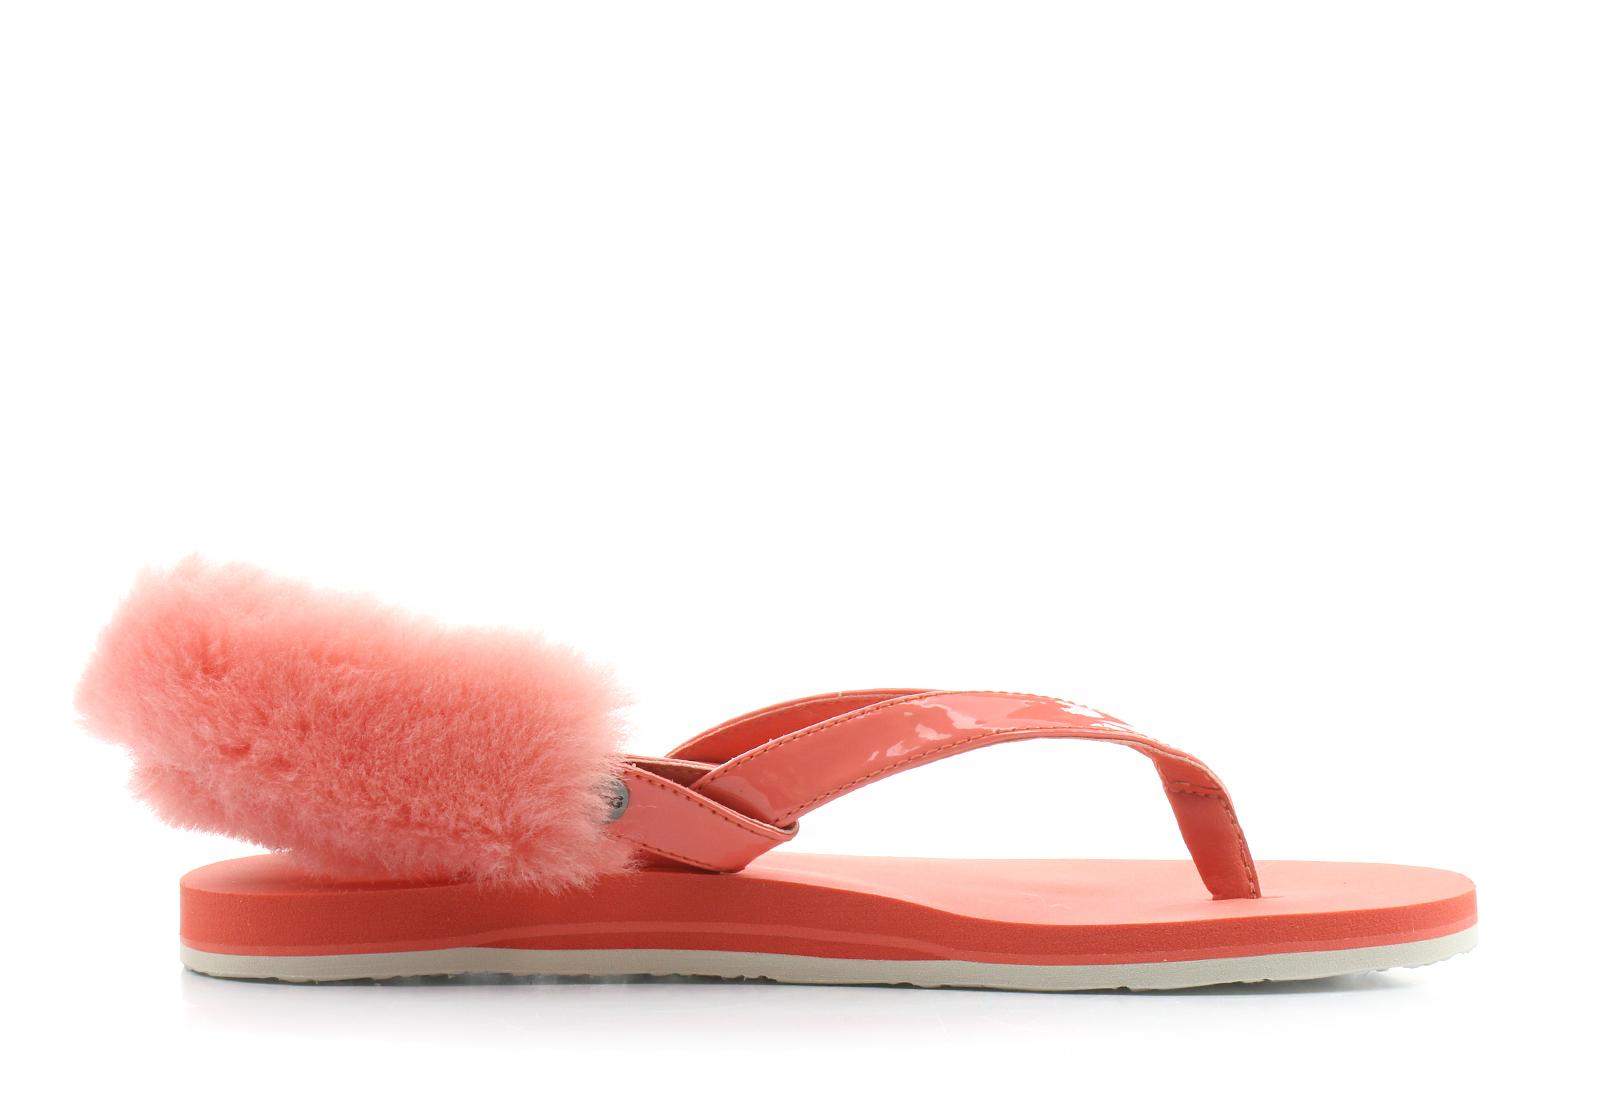 8d37bf92ad8 Ugg Sandals - Laalaa - 1090387-VCRL - Online shop for sneakers ...